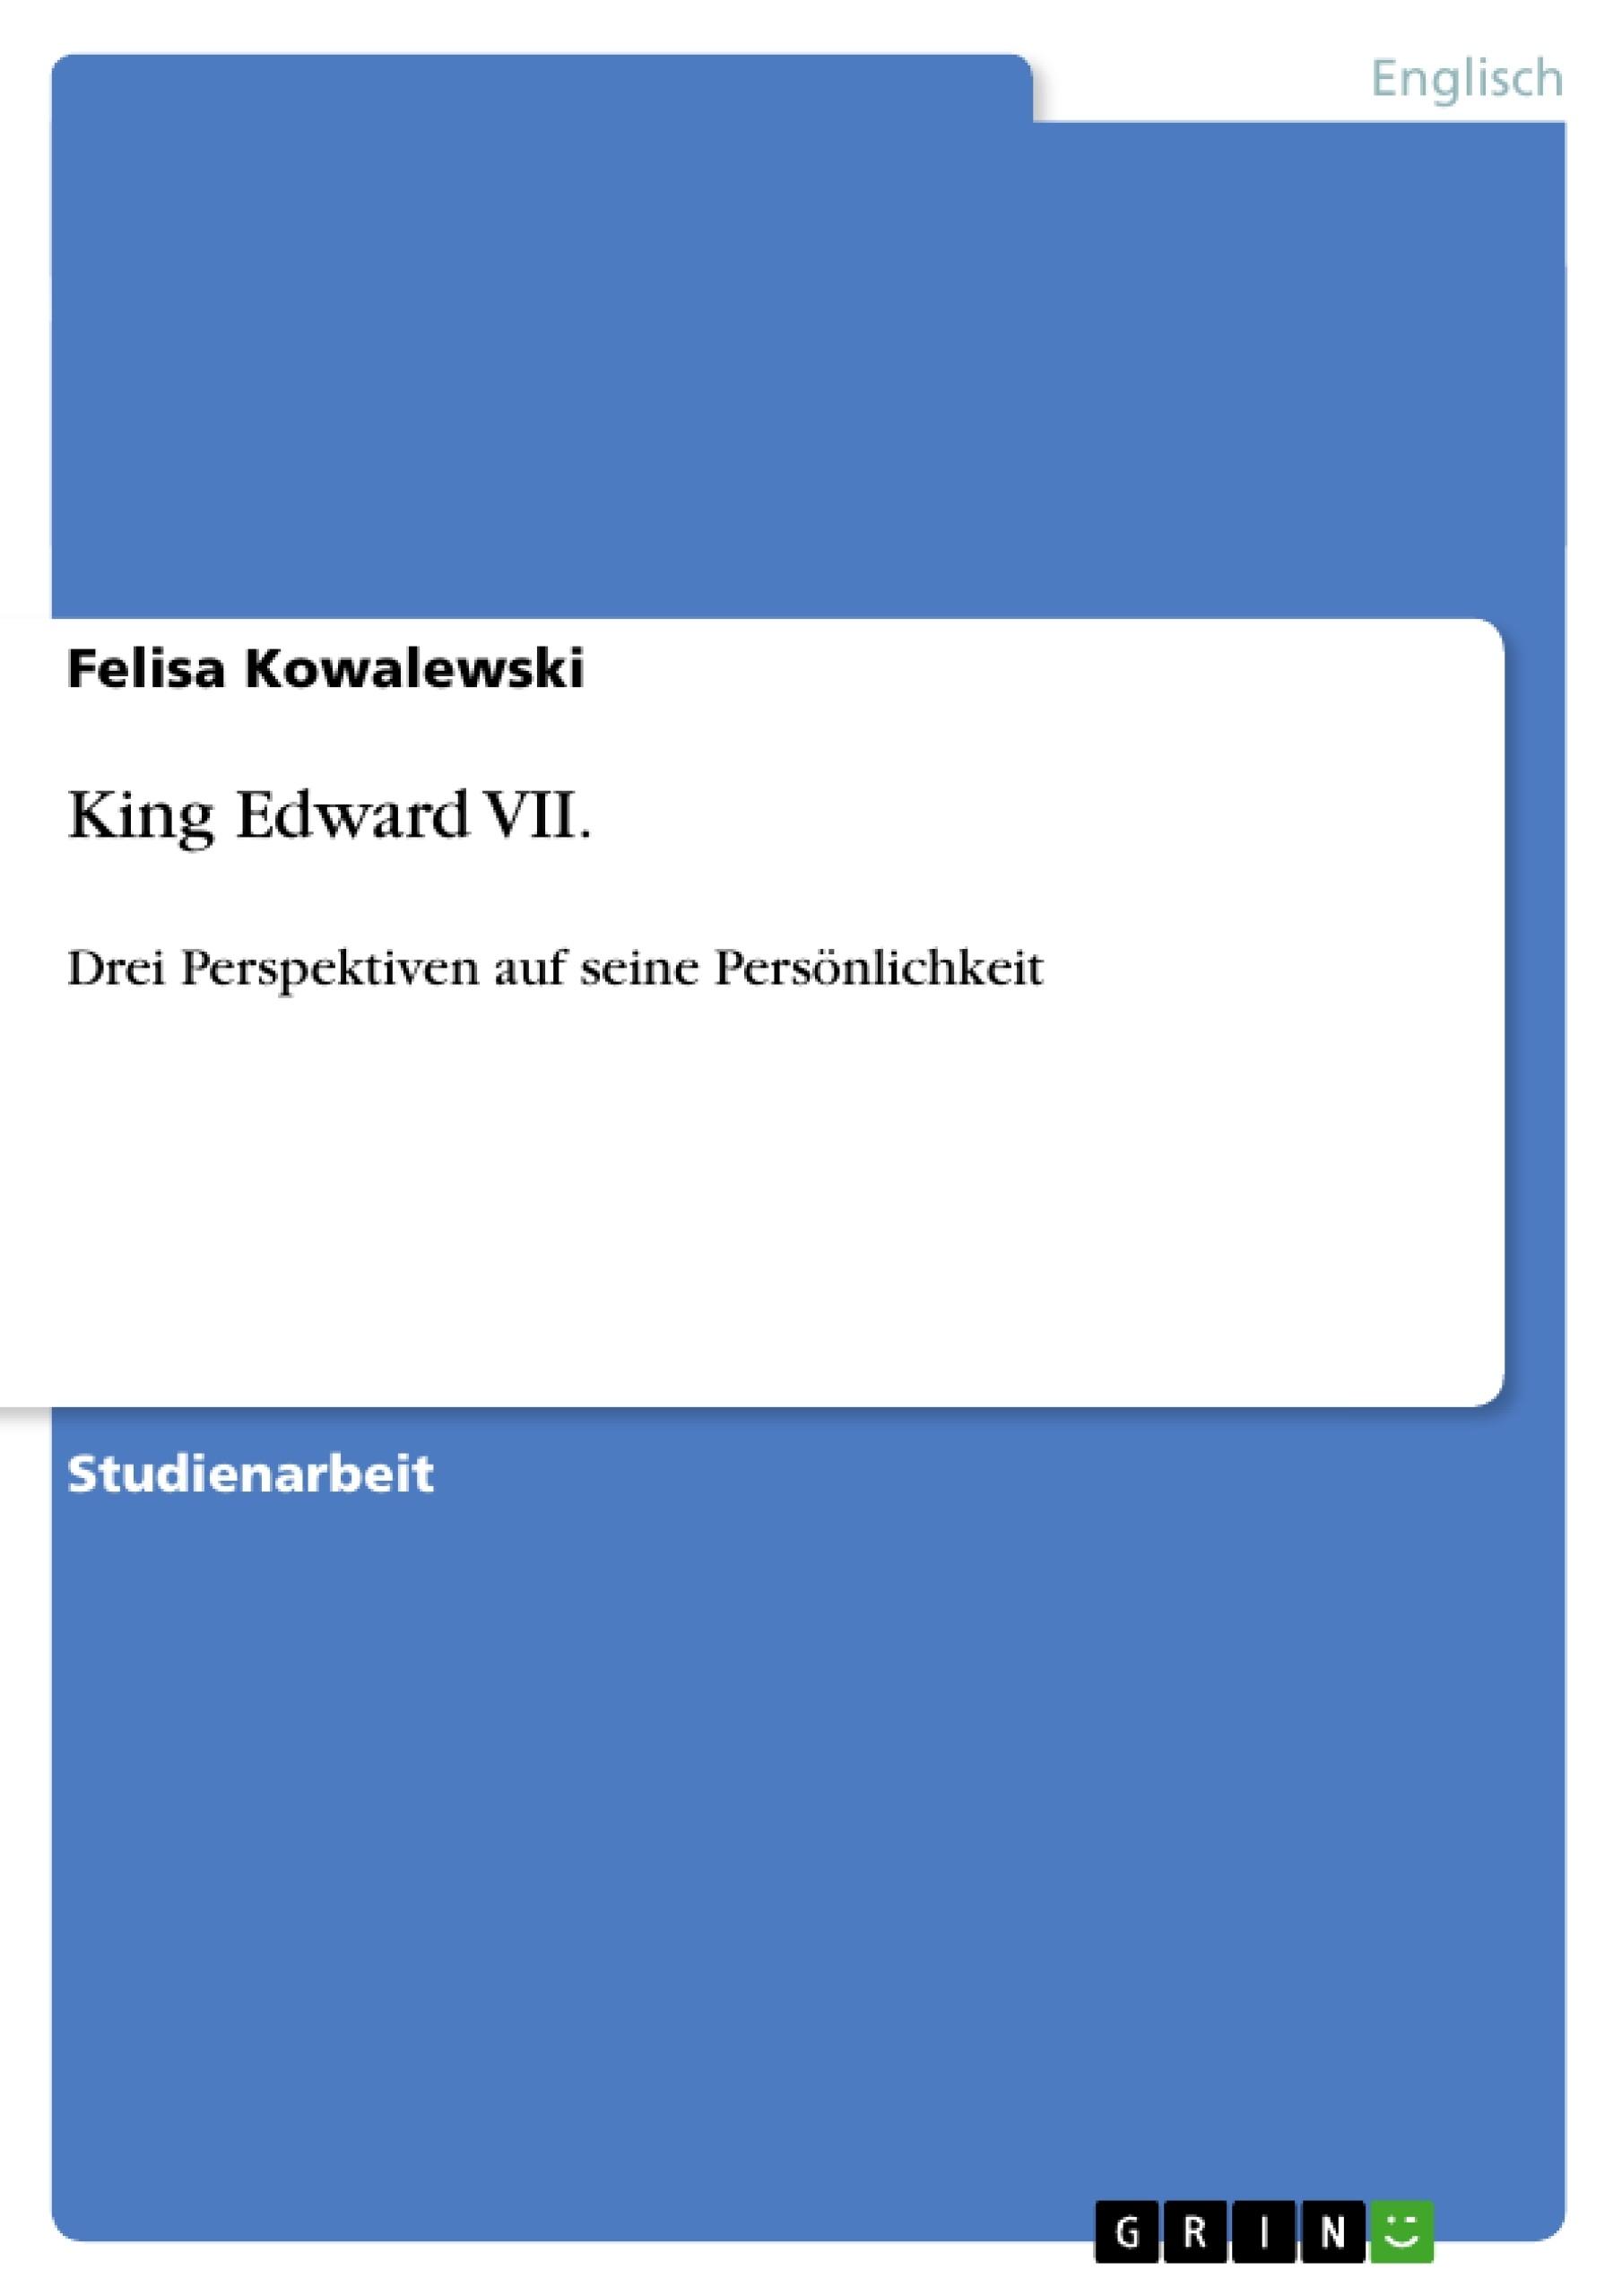 Titel: King Edward VII.